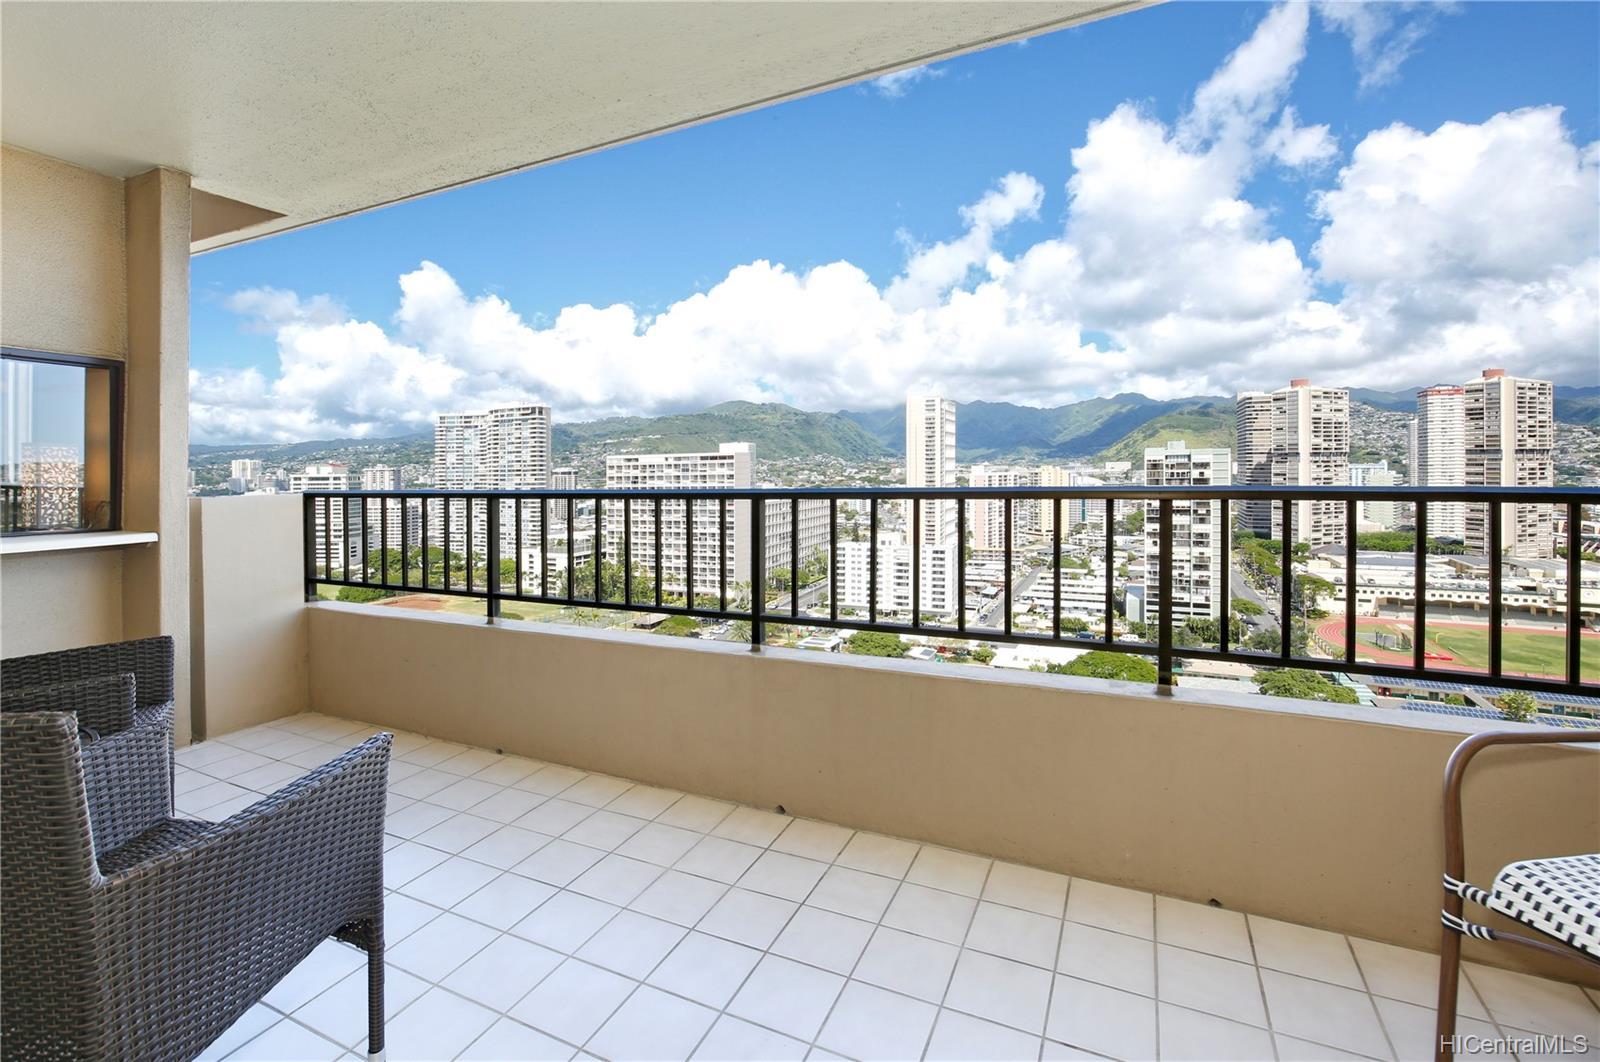 2121 Ala Wai Blvd Honolulu - Rental - photo 6 of 16